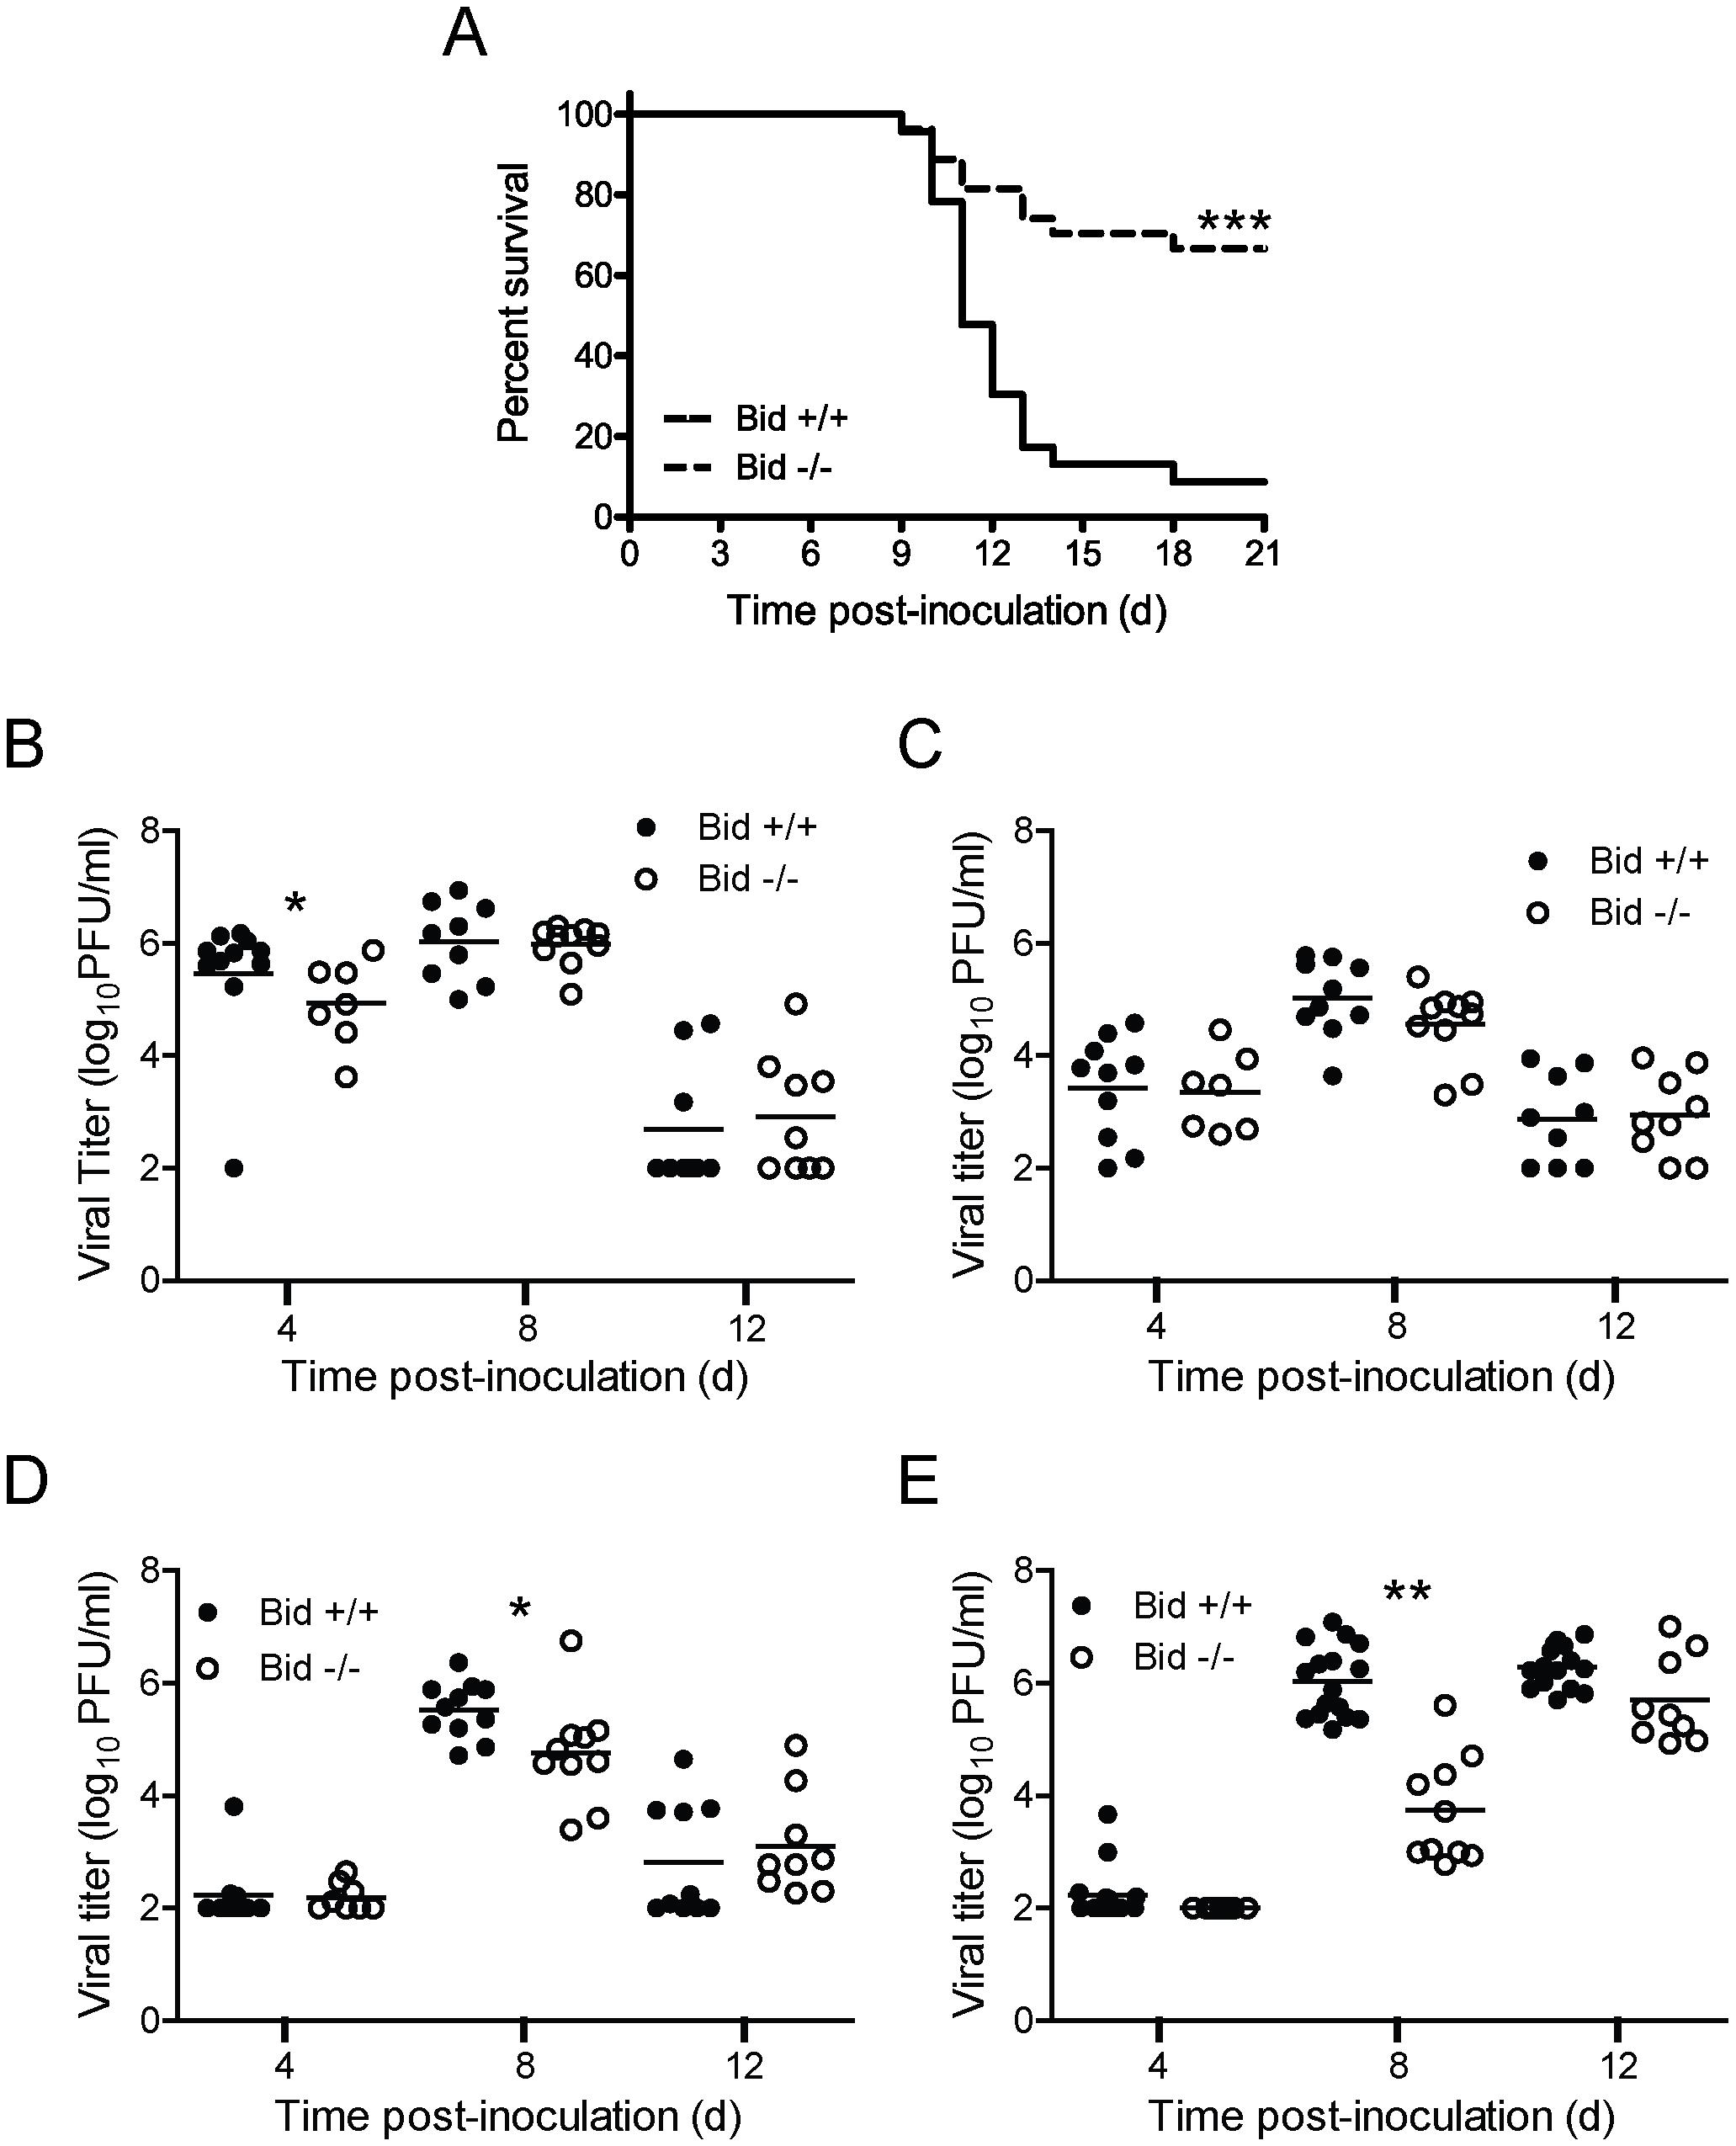 Bid modulates reovirus replication and pathogenesis following PO inoculation.